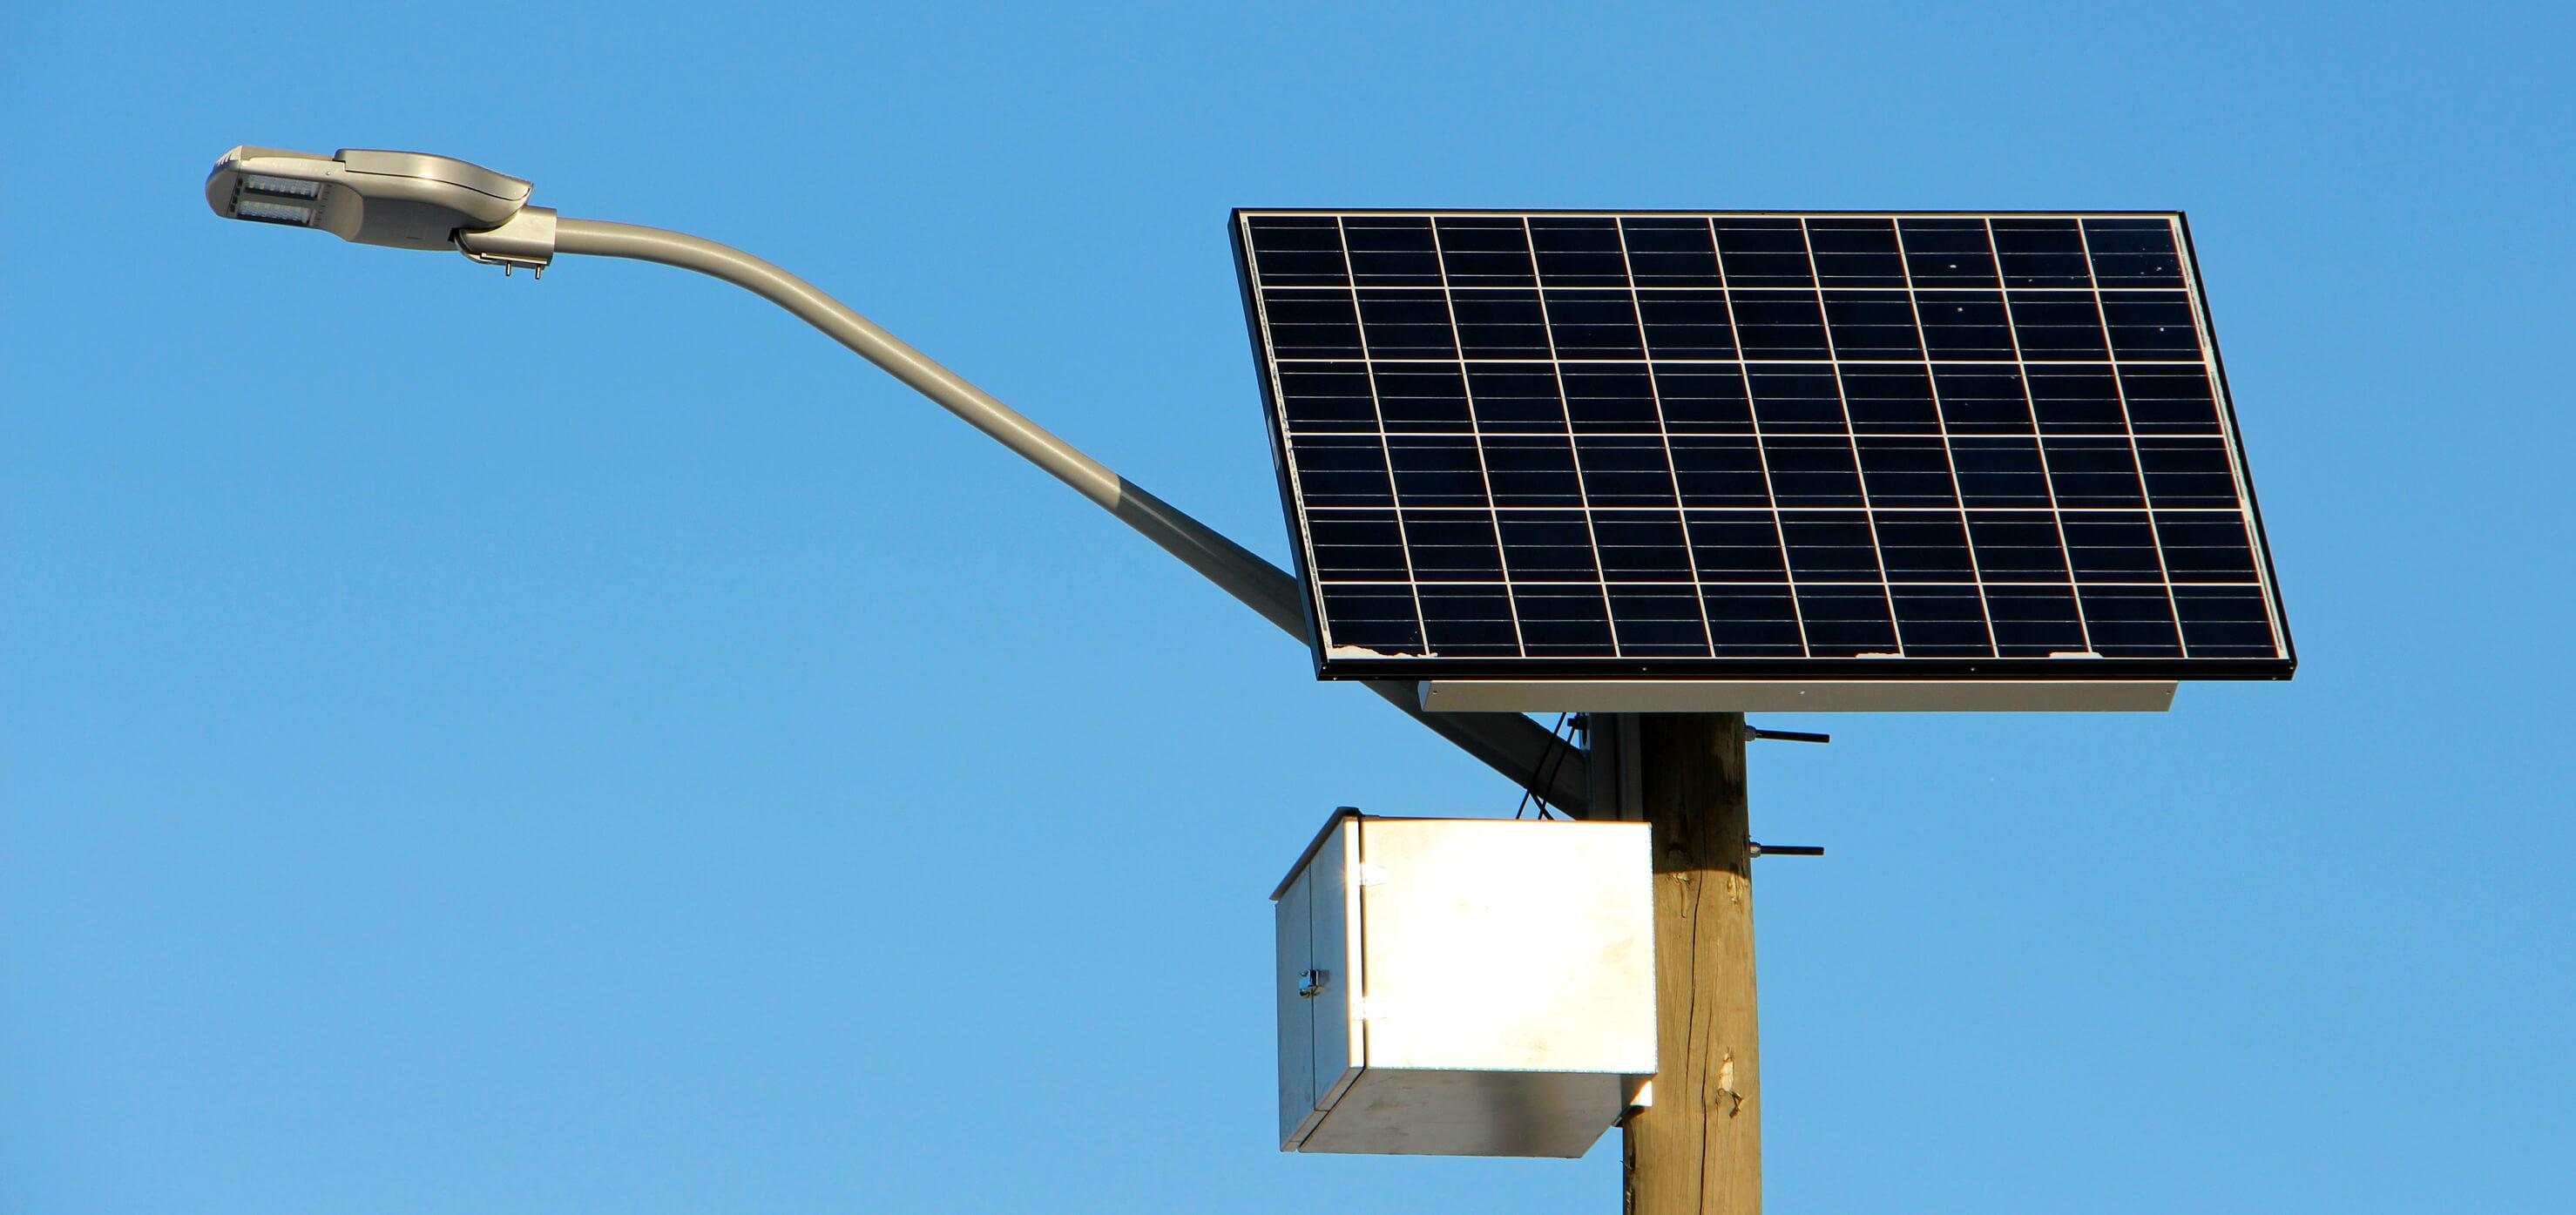 Luminarias solares para alumbrado público, un cambio necesario 2